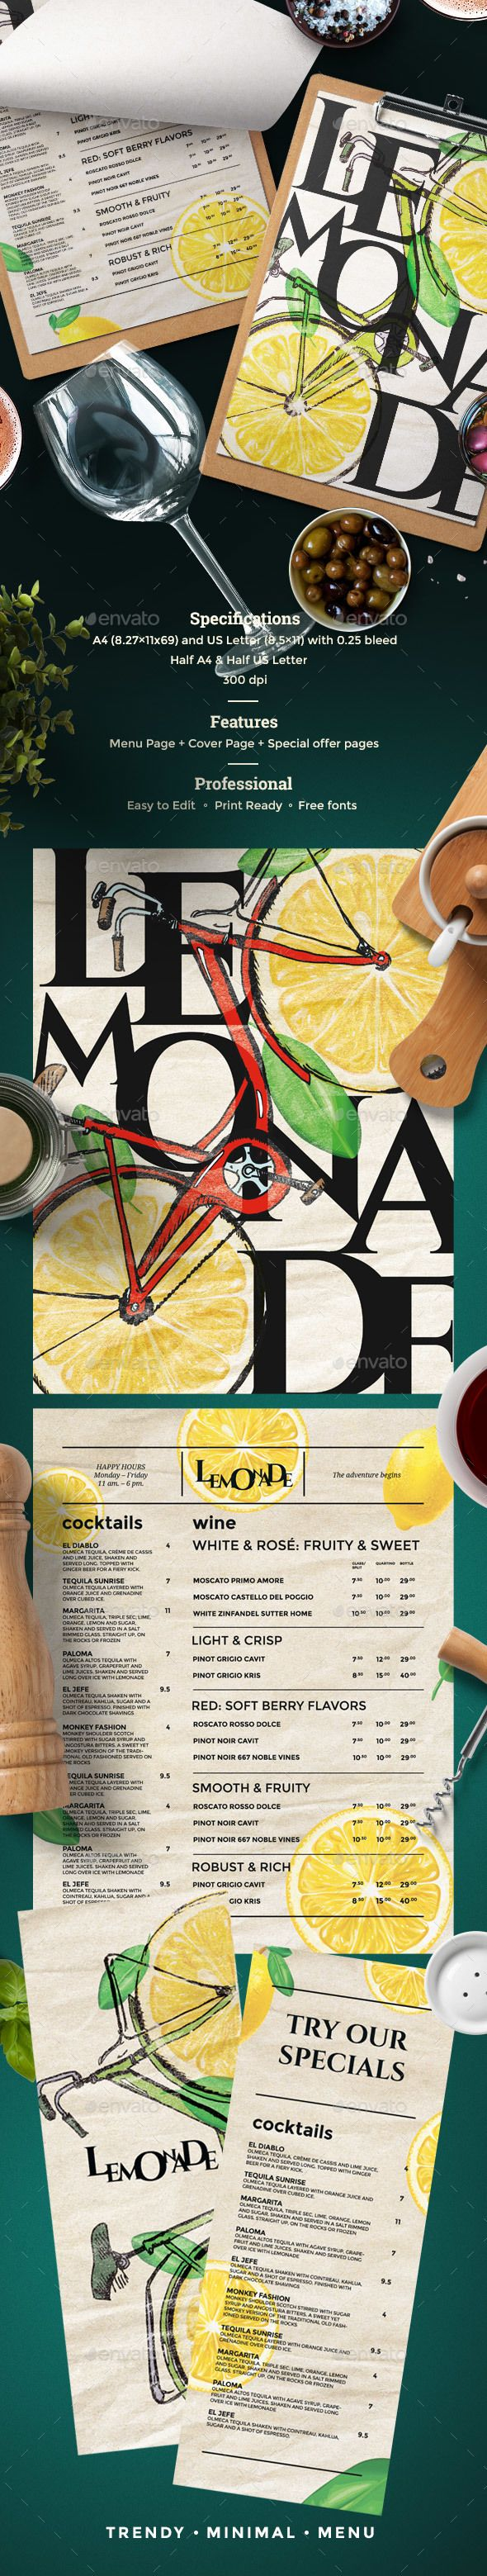 Drinks Menu — Photoshop PSD #restaurant #menu • Download ➝ https://graphicriver.net/item/drinks-menu/21496020?ref=pxcr